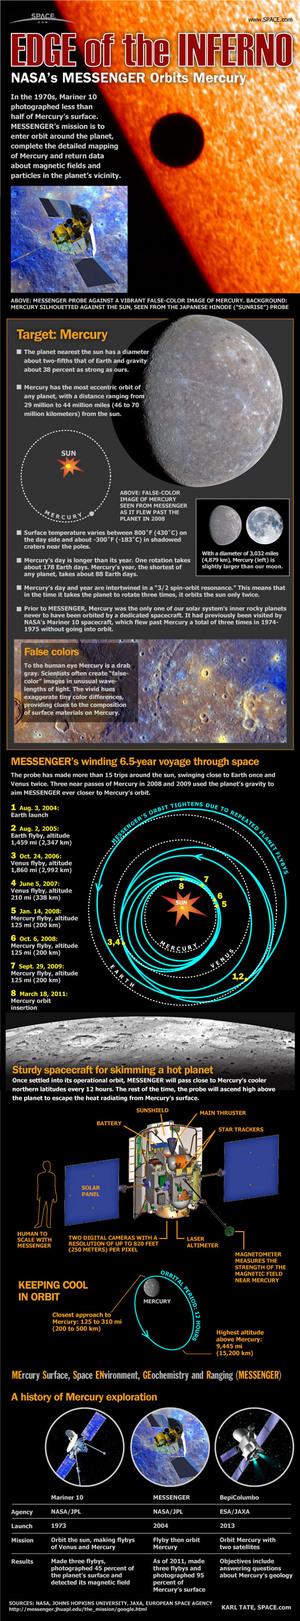 Strange 'Hollows' on Mercury Revealed by NASA Probe as ...